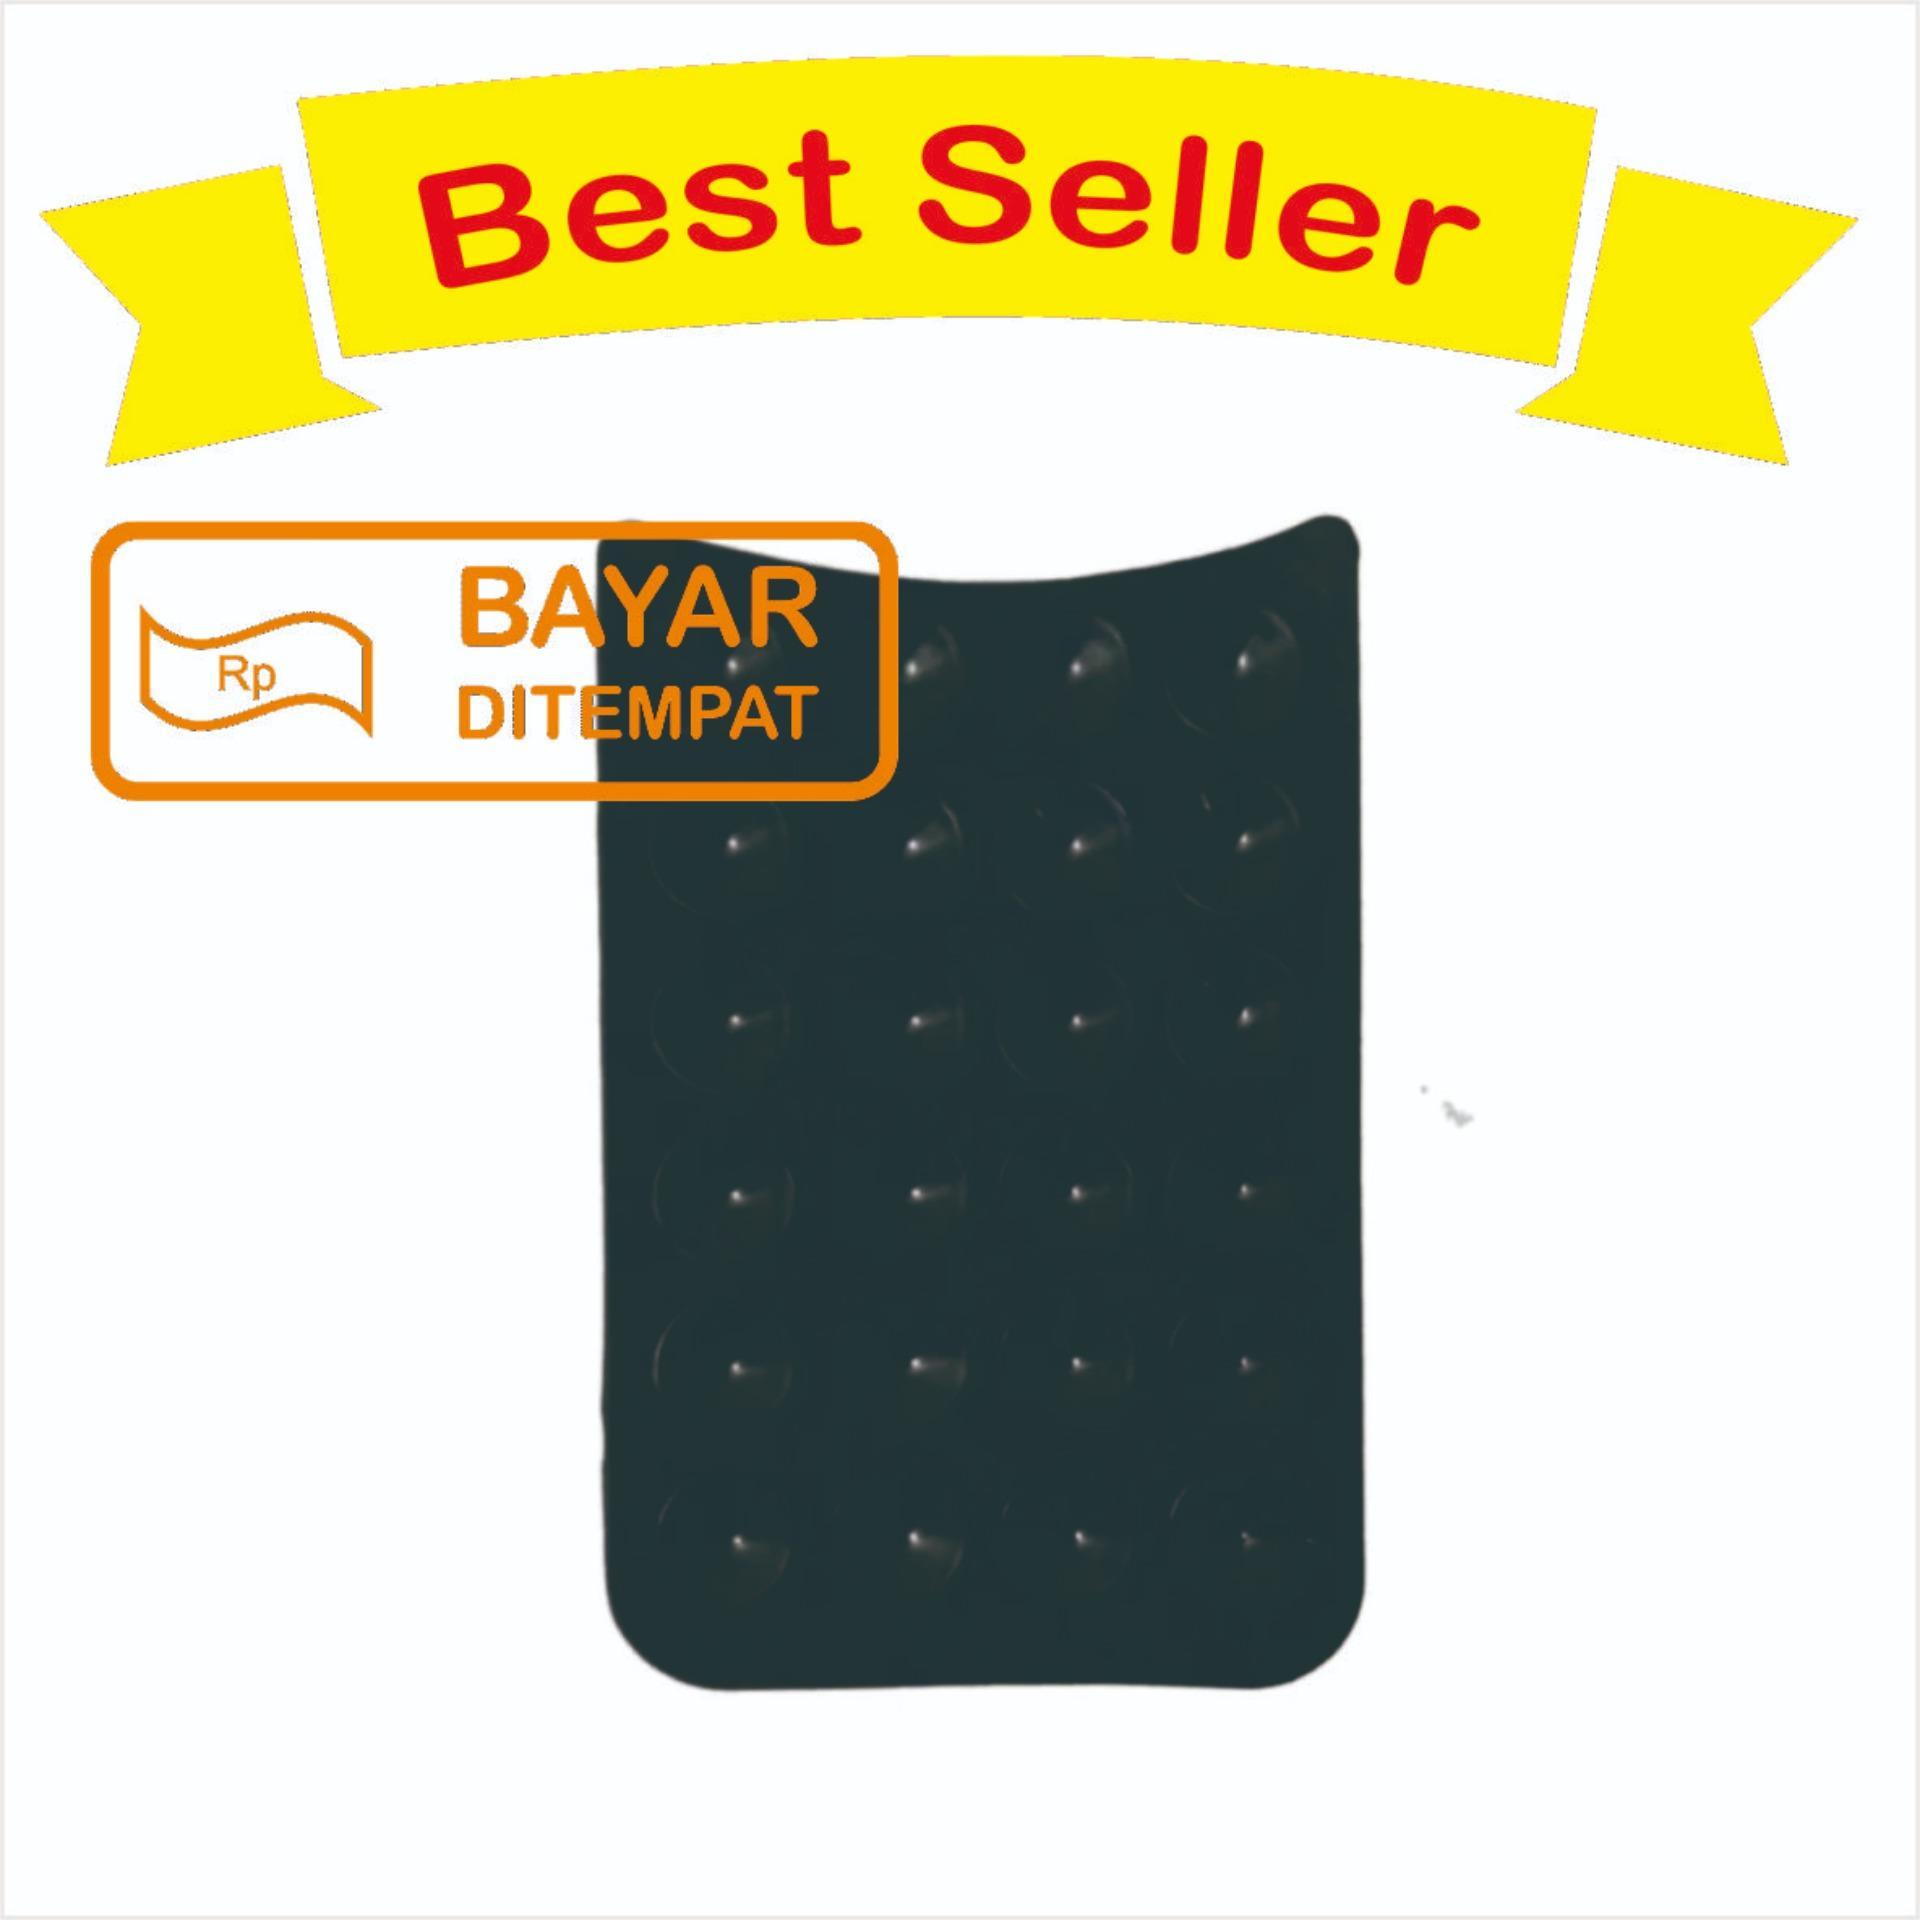 HB Tempelan Belakang HP Stand Holder Gurita Universal 24 Tentakel Perekat Handphone | Lazada Indonesia